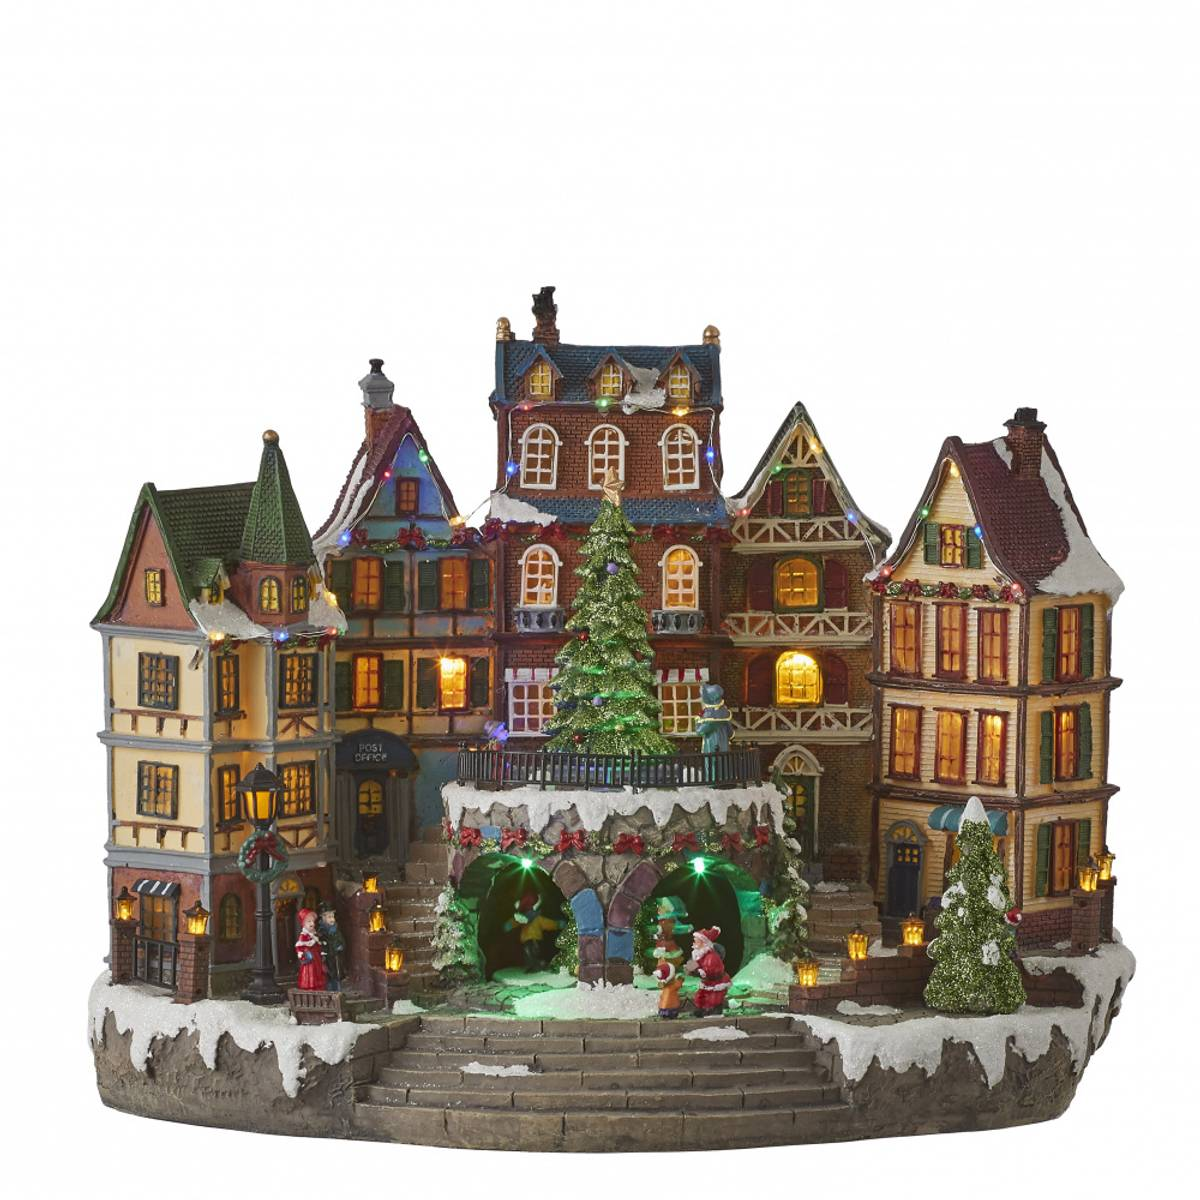 Stort bymotiv med juletre - Juleby Luville